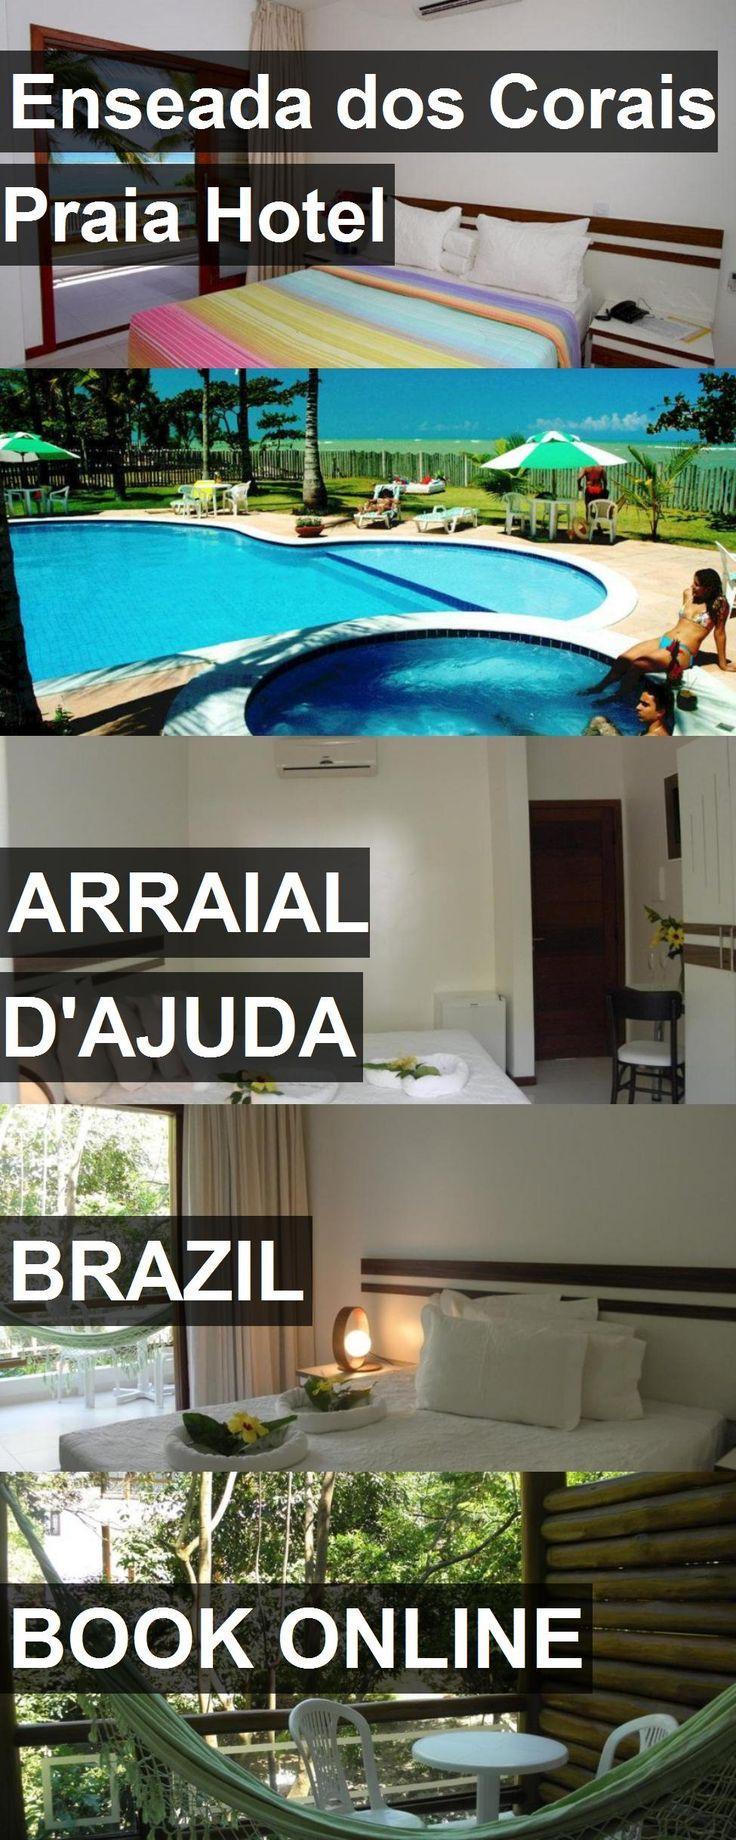 Enseada dos Corais Praia Hotel in Arraial D'Ajuda, Brazil. For more information, photos, reviews and best prices please follow the link. #Brazil #ArraialD'Ajuda #travel #vacation #hotel